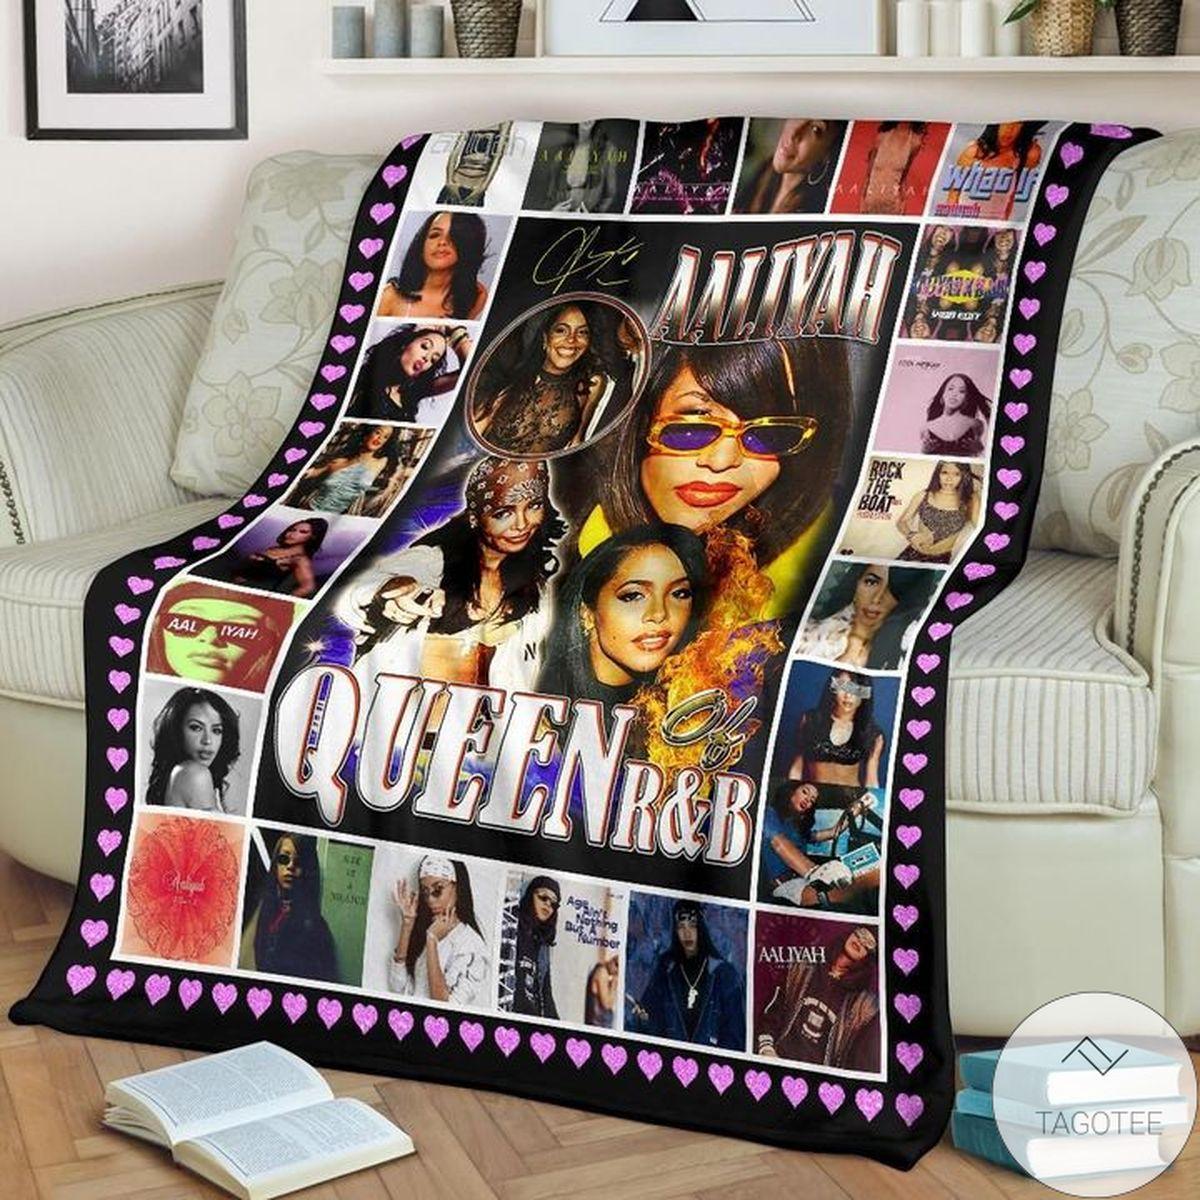 Aaliyah Queen Of R&b Blanket a